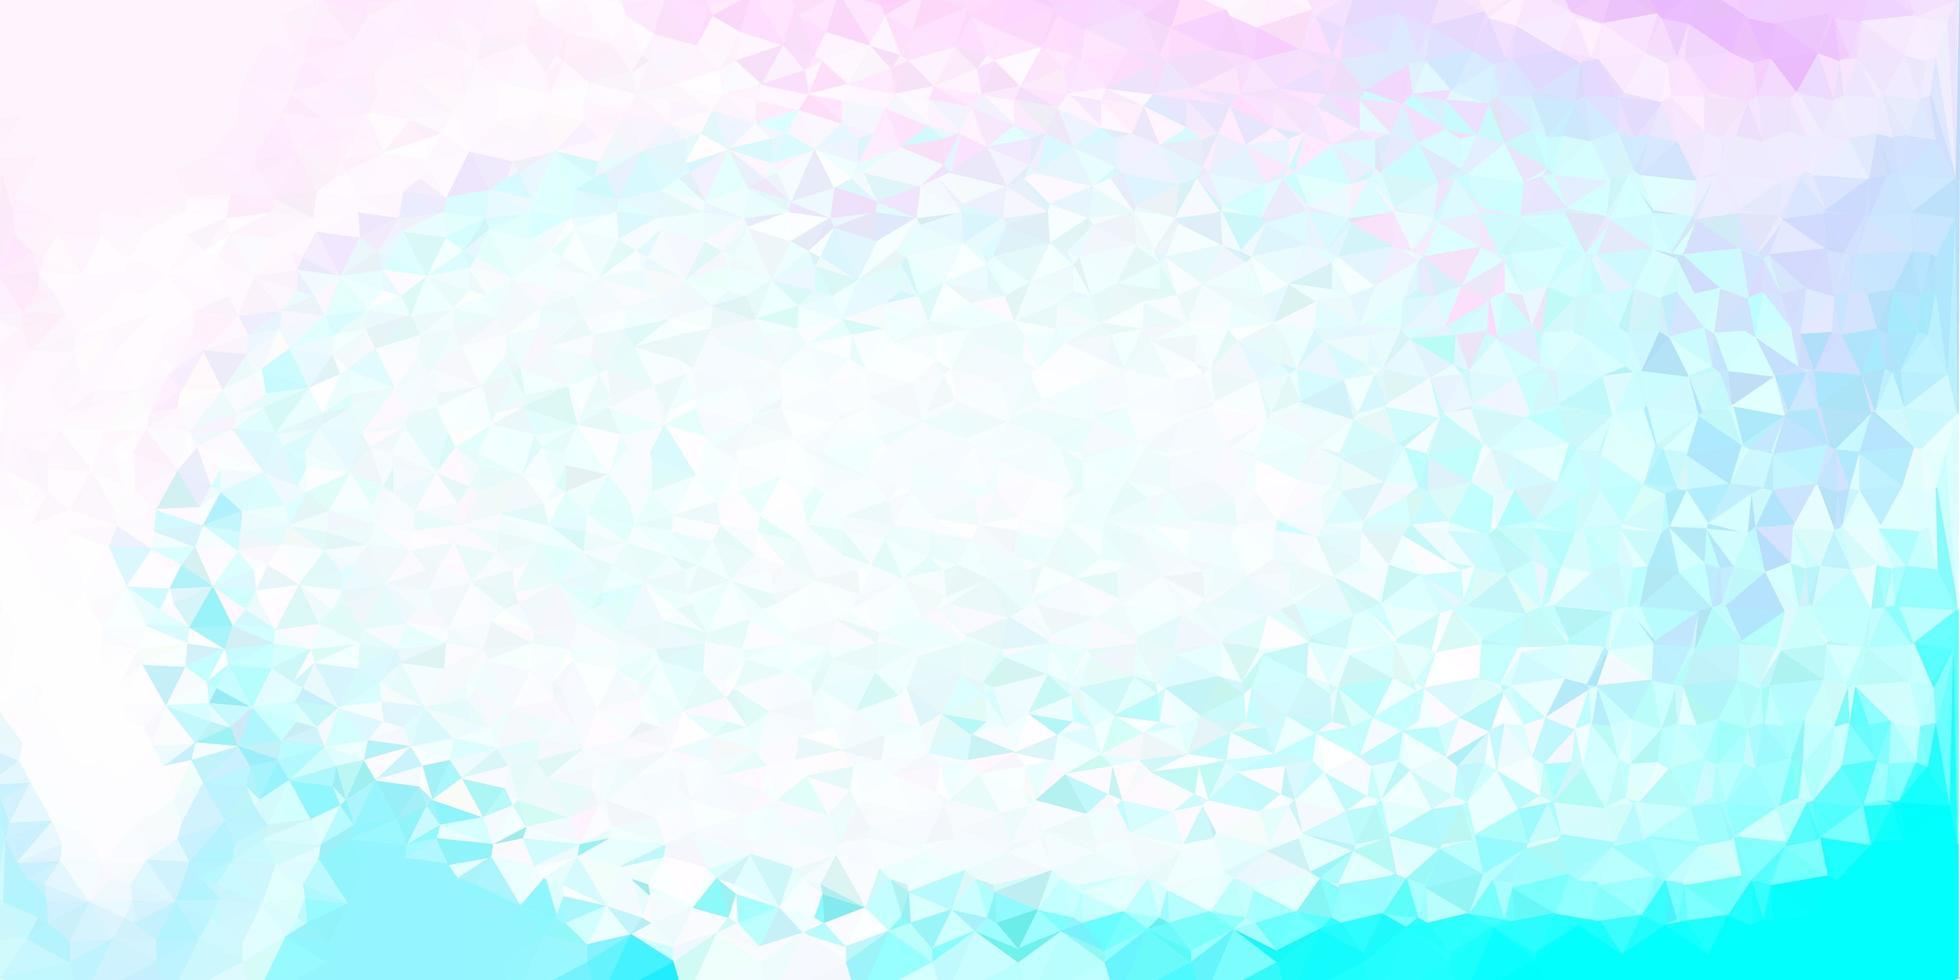 textura de triángulo abstracto vector rosa claro, azul.